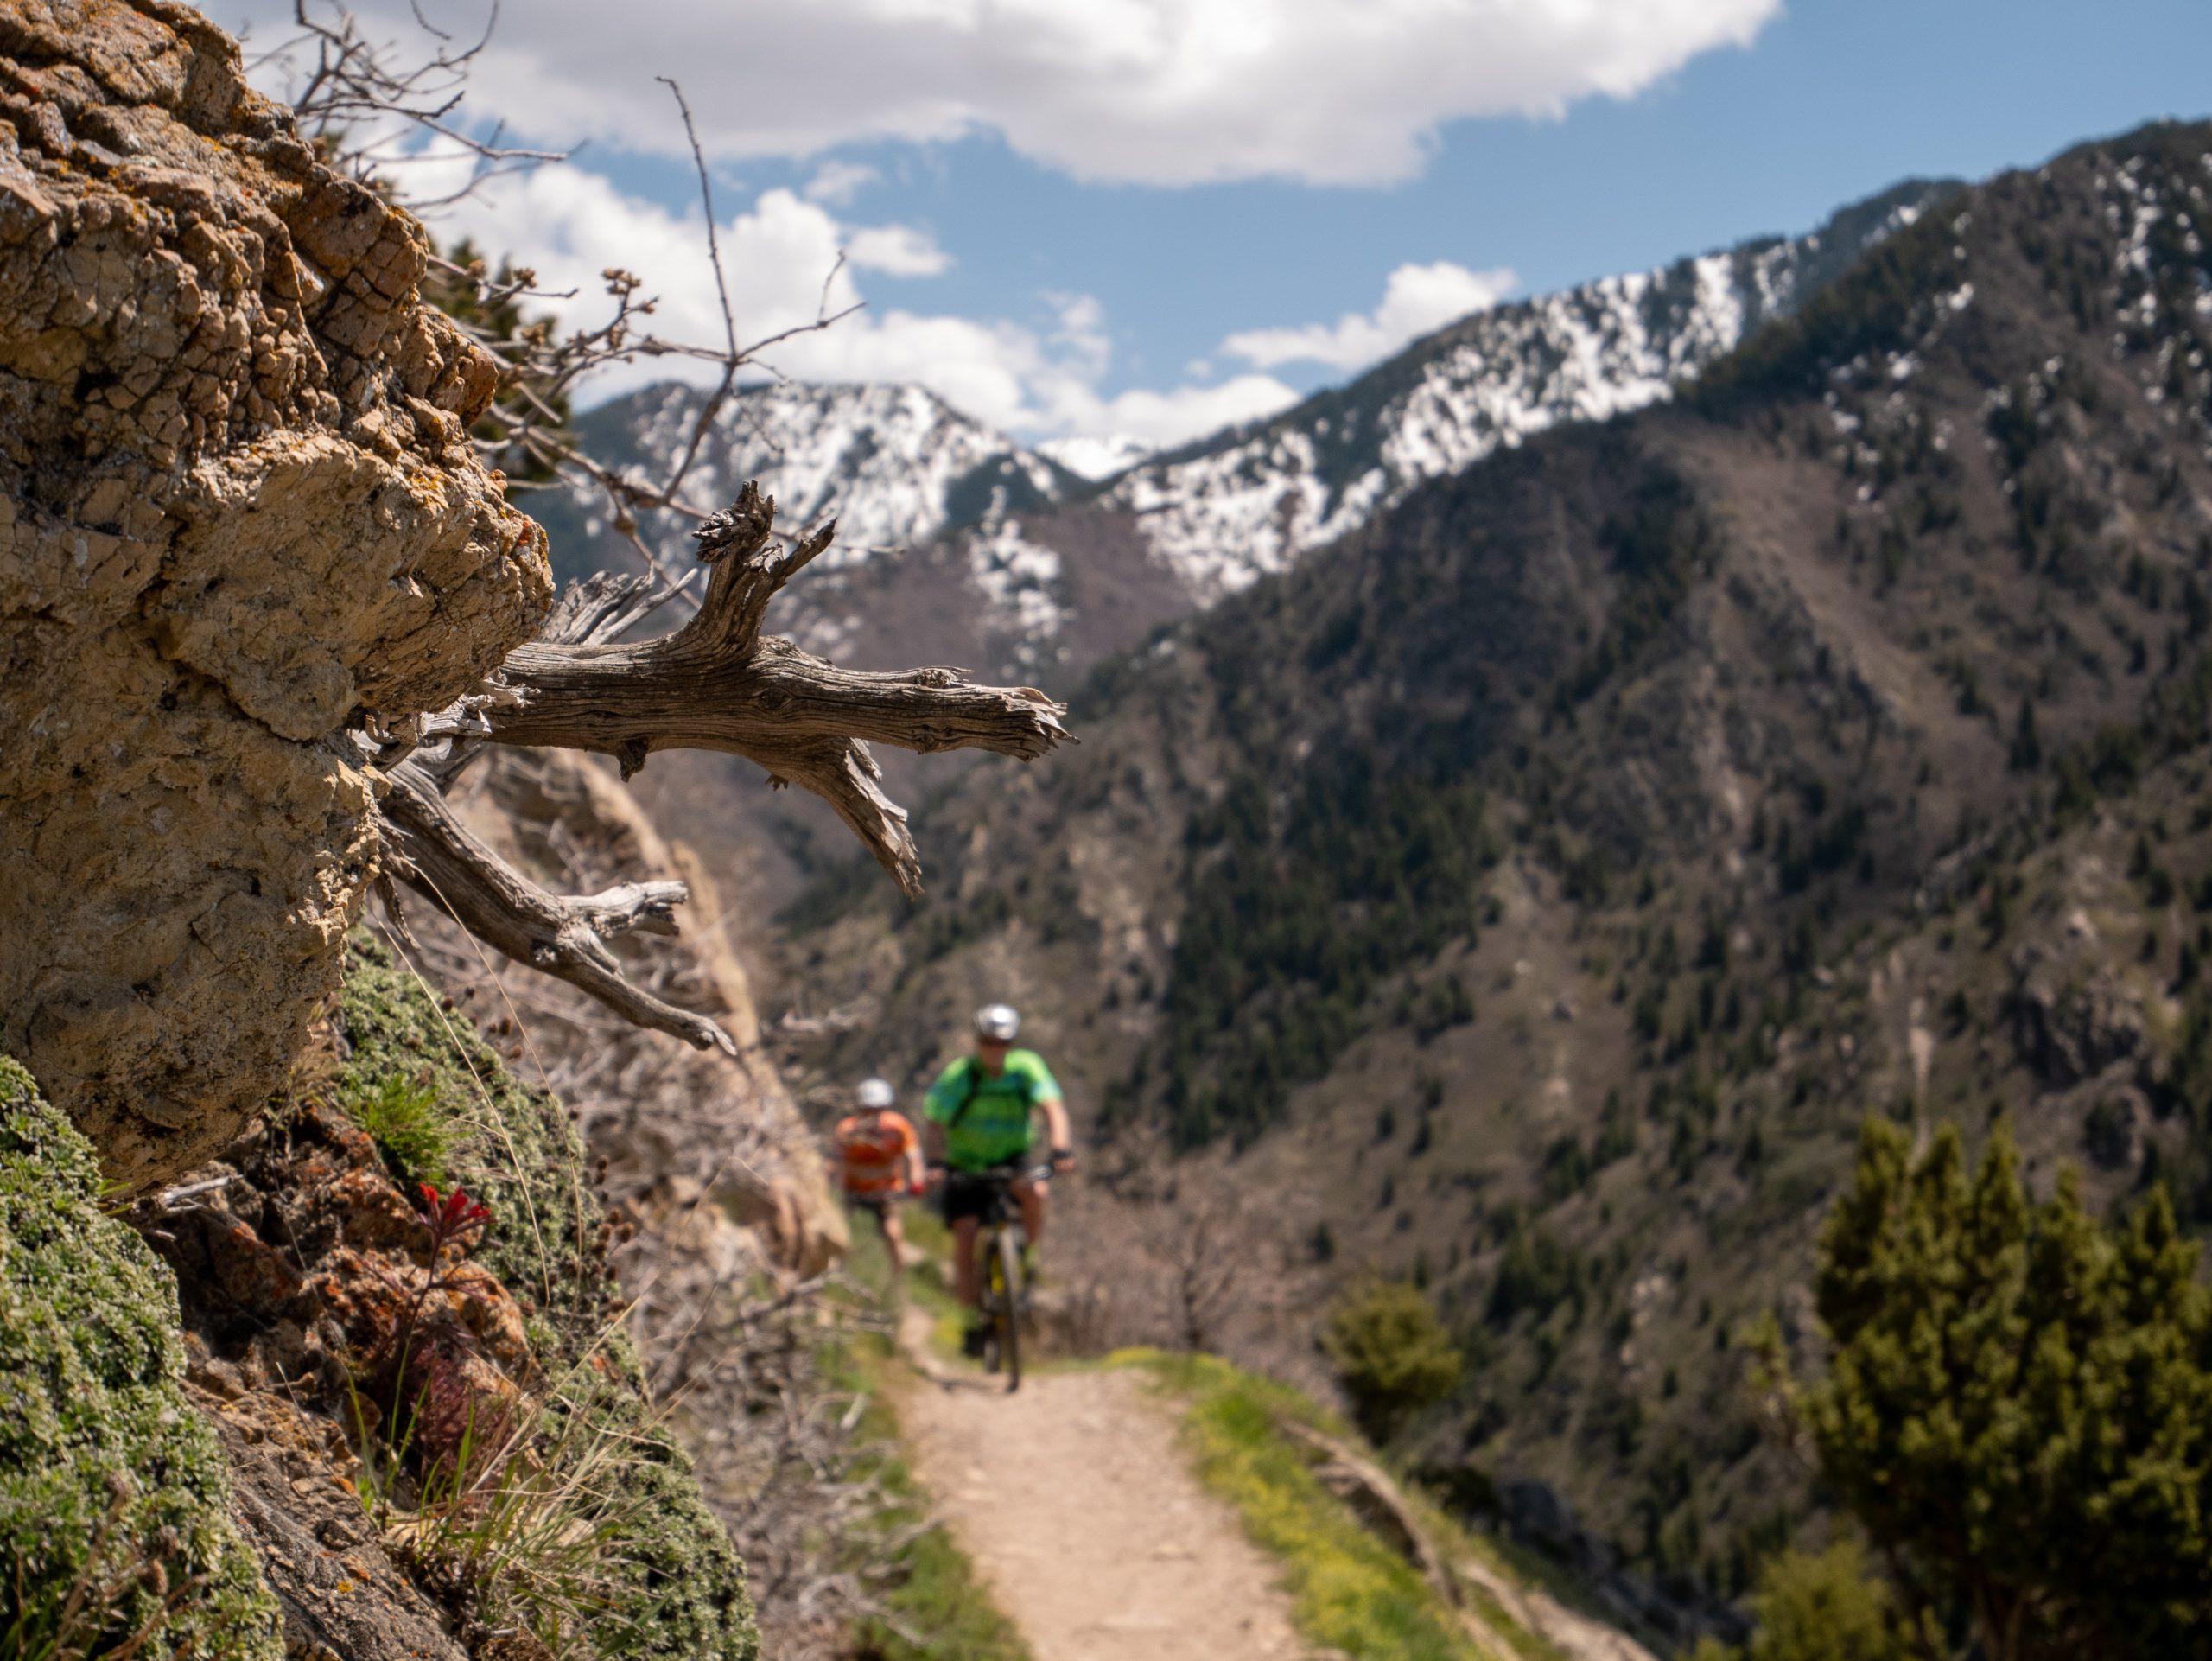 Two mountain bikers in distance on narrow Rattlesnake Gulch trail, Salt Lake City